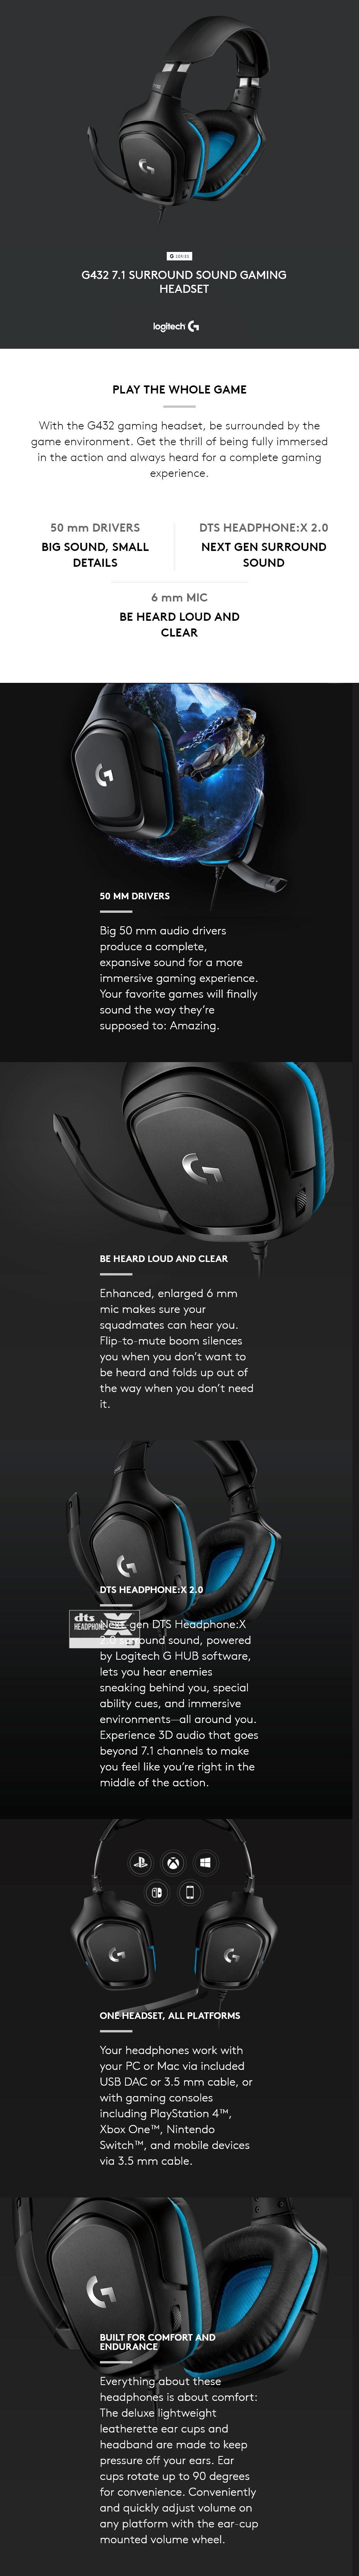 Logitech G432 7 1 Surround Sound Wired Gaming Headset